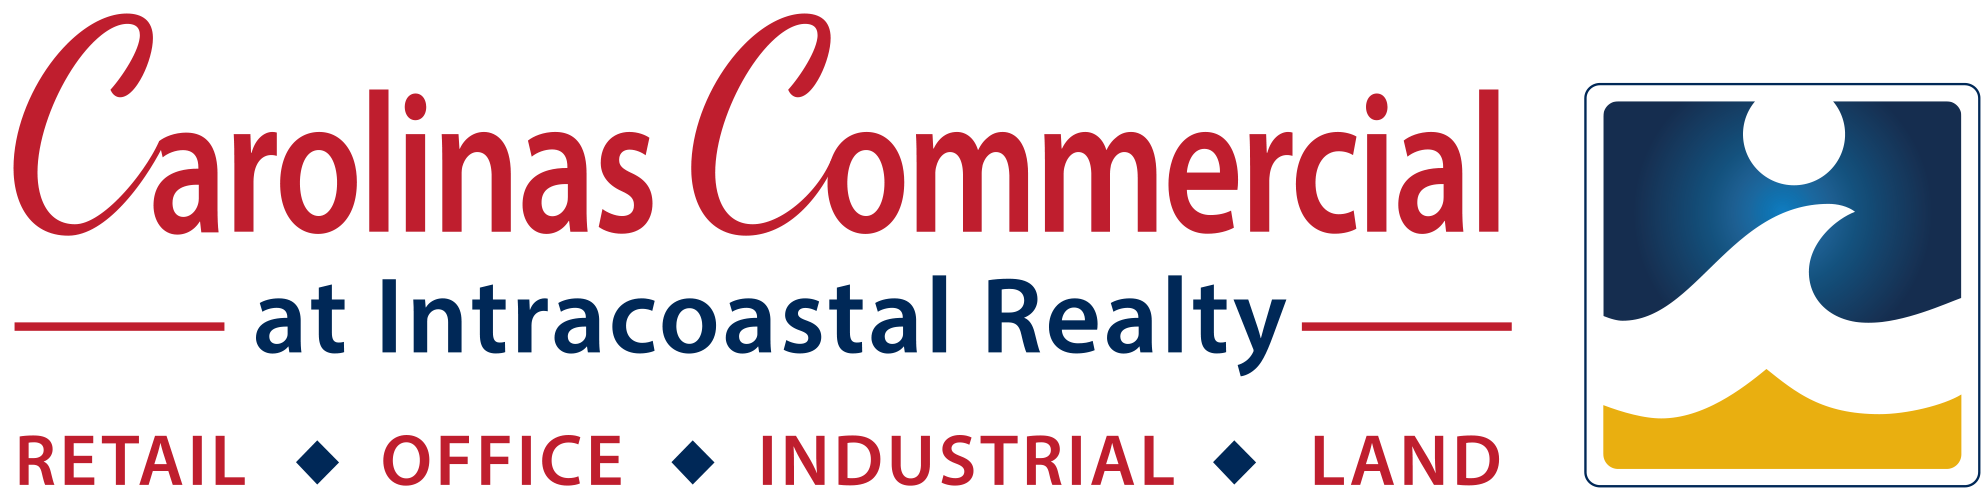 Carolinas Commercial with Intracoastal Realty Corporation